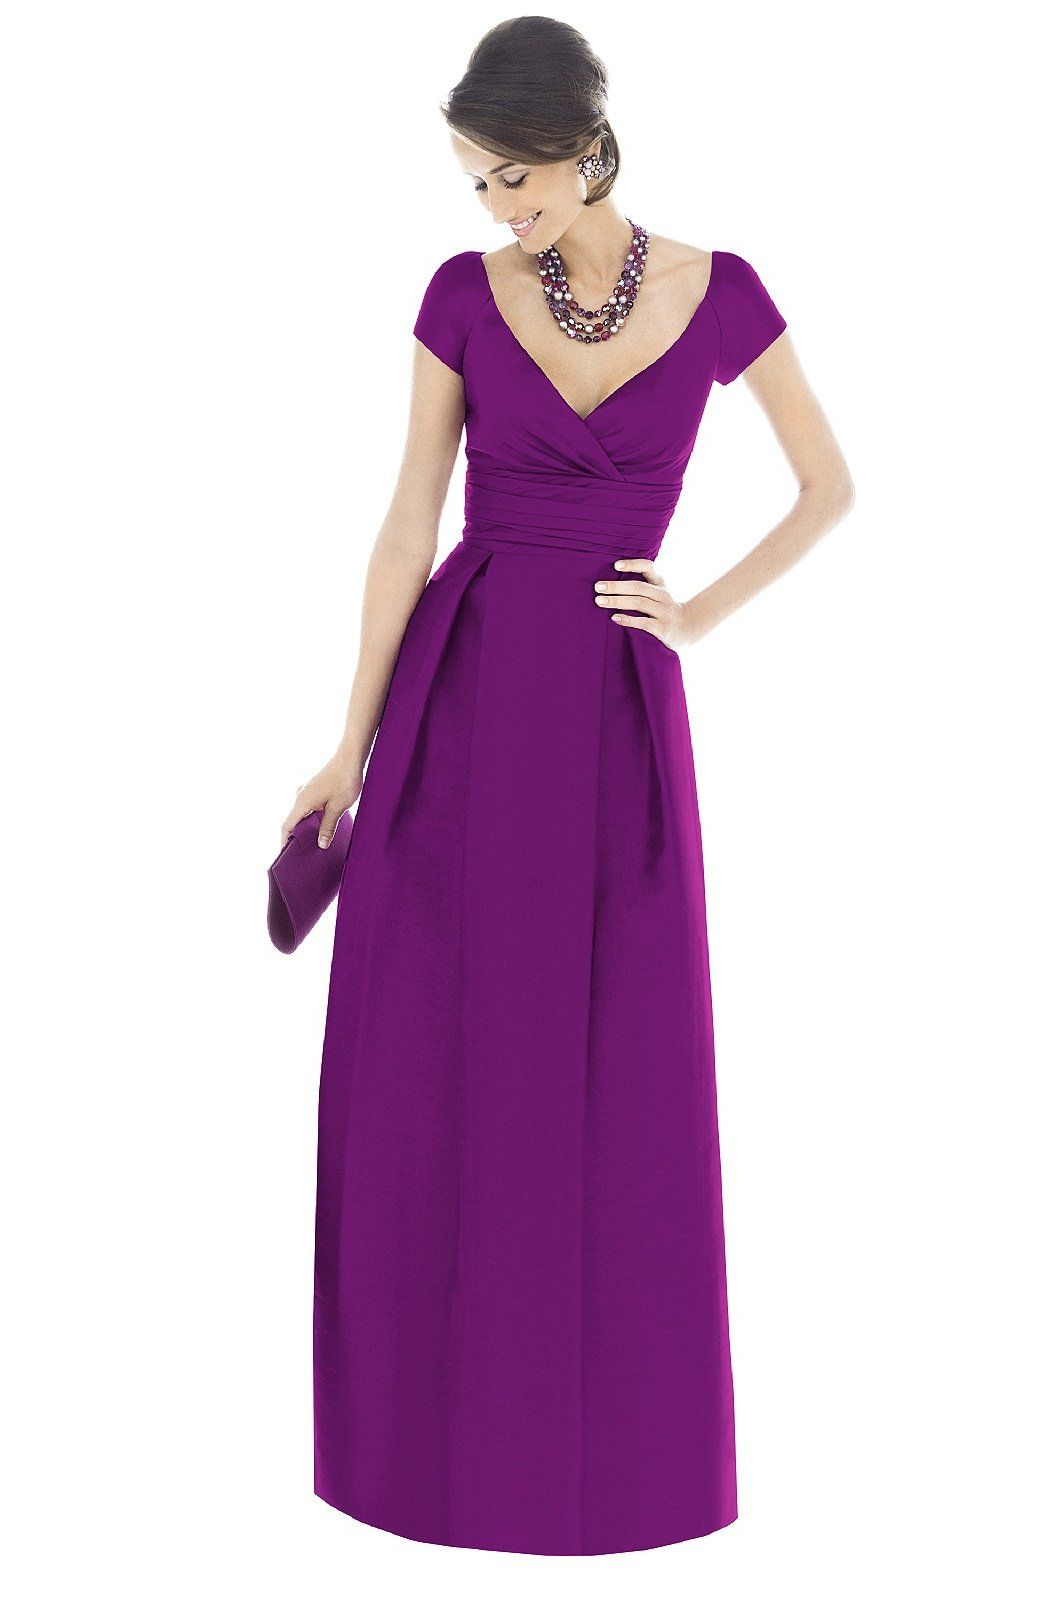 Shop Alfred Sung Bridesmaid Dress - D501 in Dupioni at Weddington ...